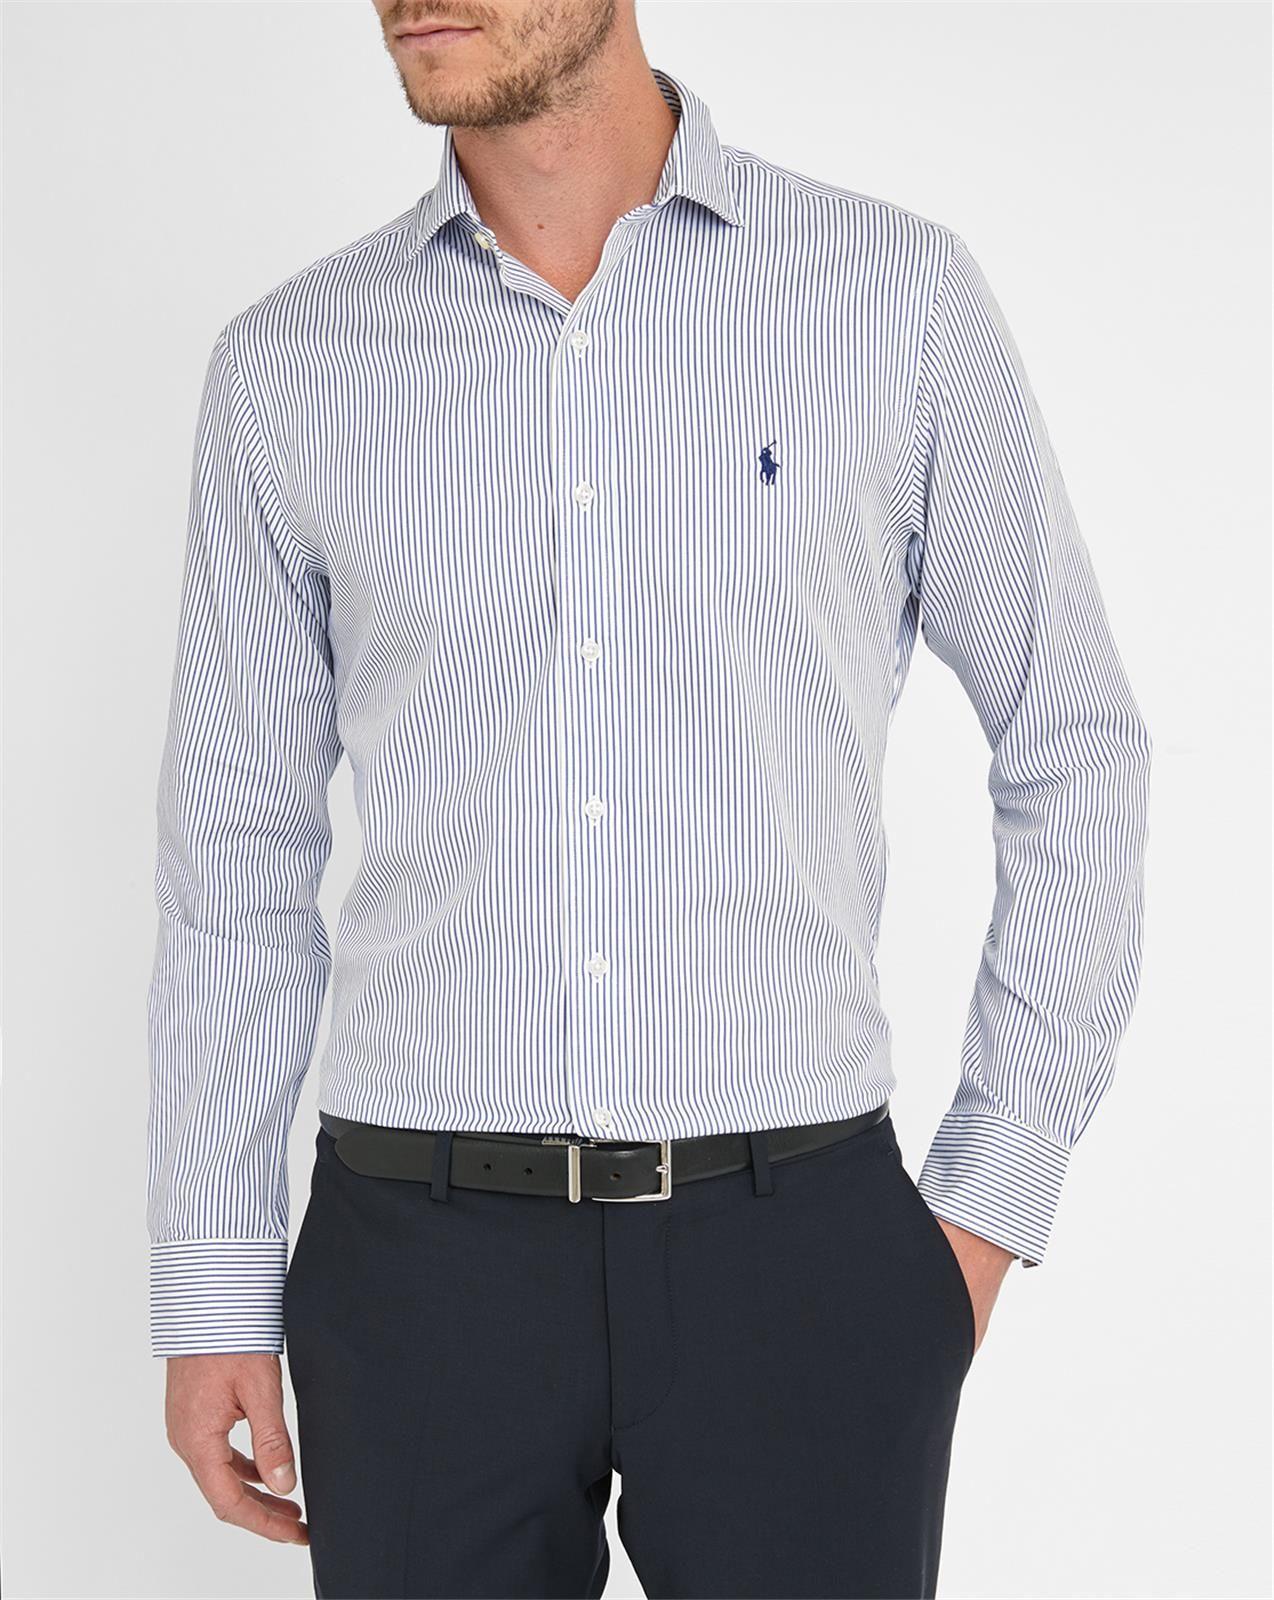 polo ralph lauren white blue striped slim fit shirt in. Black Bedroom Furniture Sets. Home Design Ideas